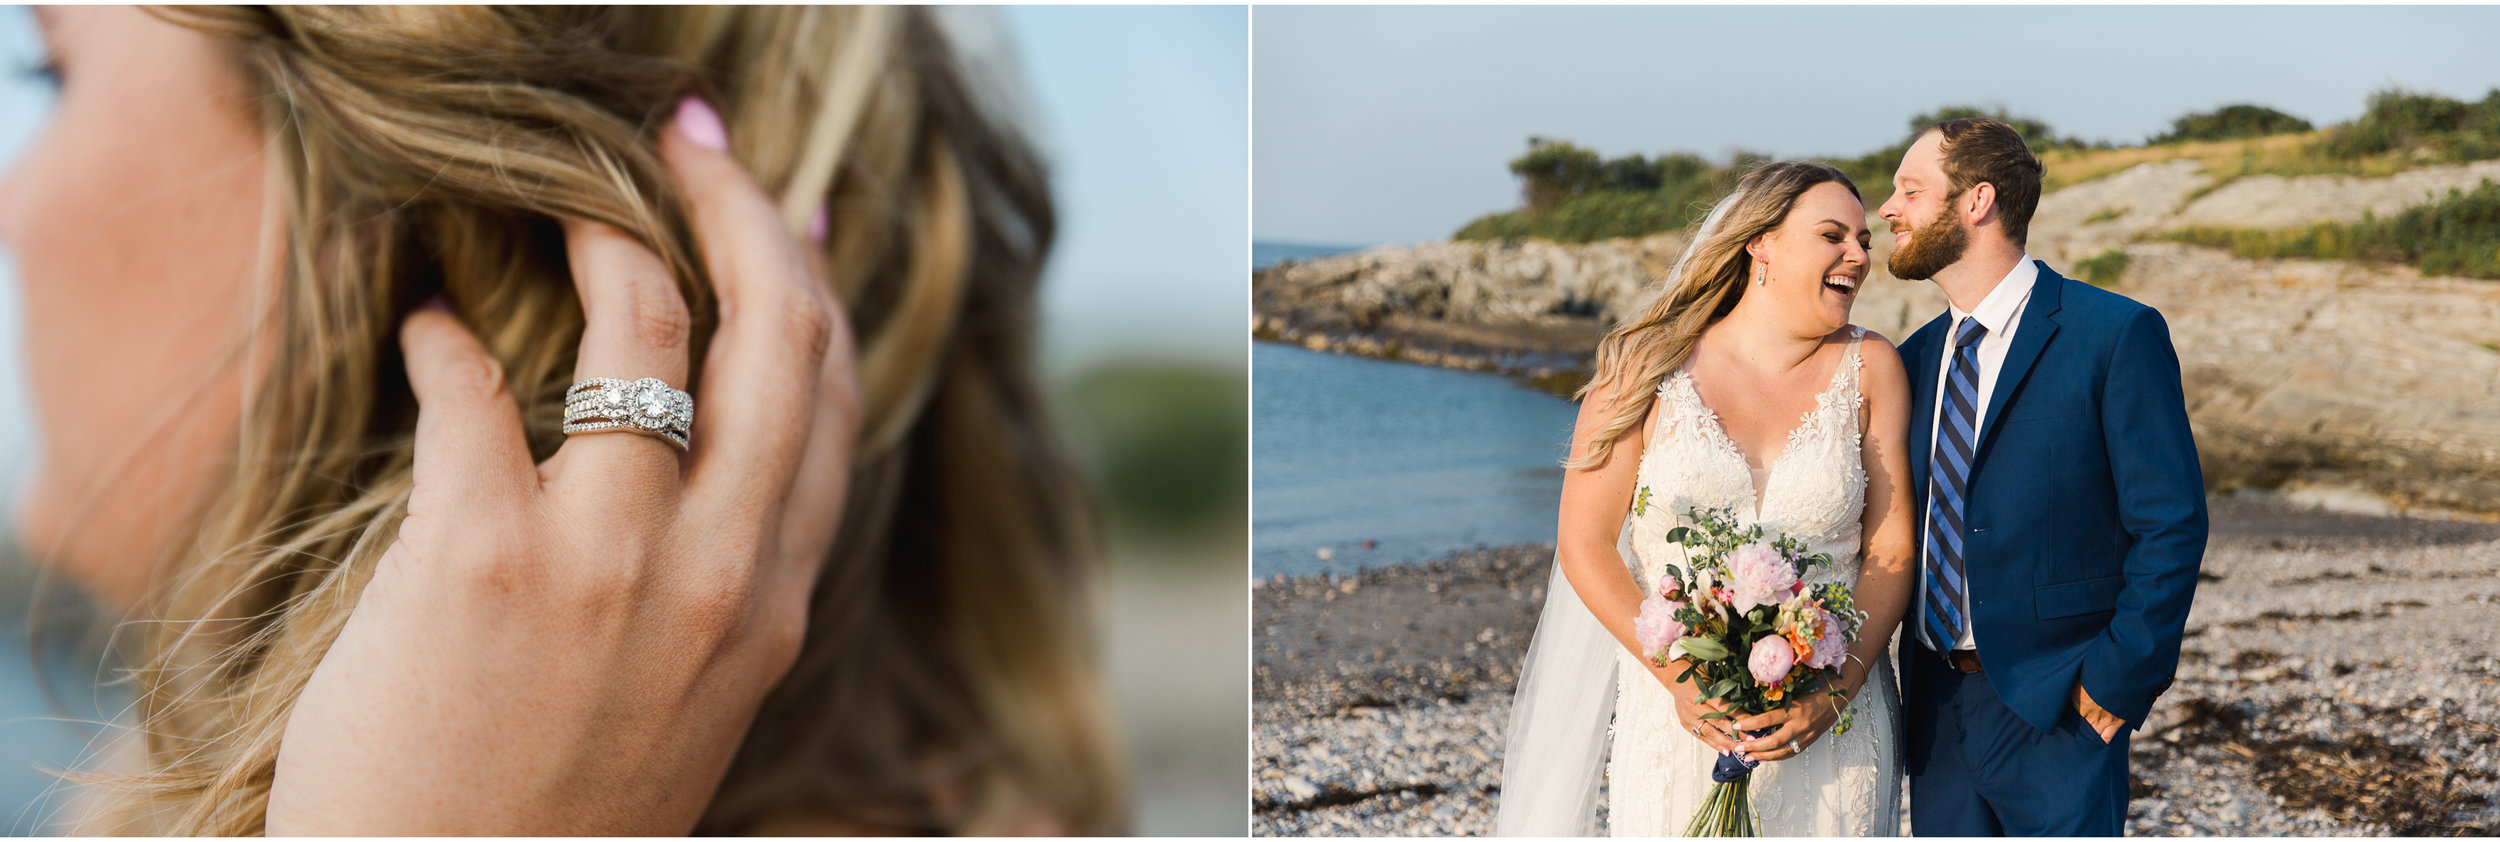 Cape Elizabeth, Maine Wedding 4.jpg